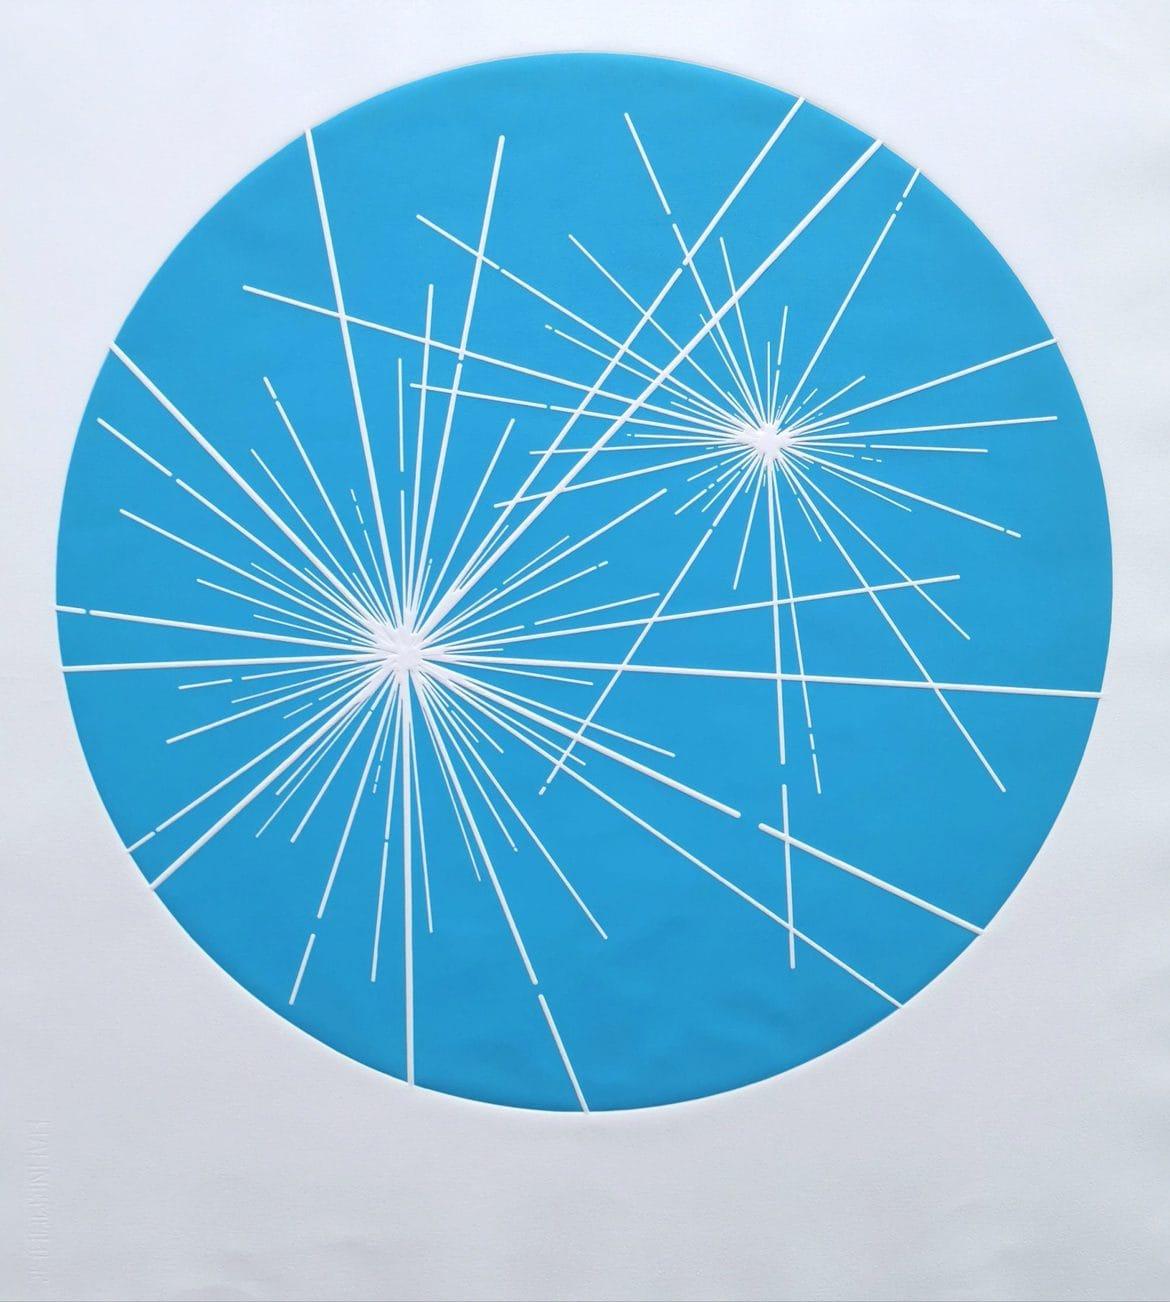 Binary Star (Sky Blue), woodblock print, 300gsm hanhemuhle deckled edge etching paper, edition of 5, 89.5cm x 81cm<br />